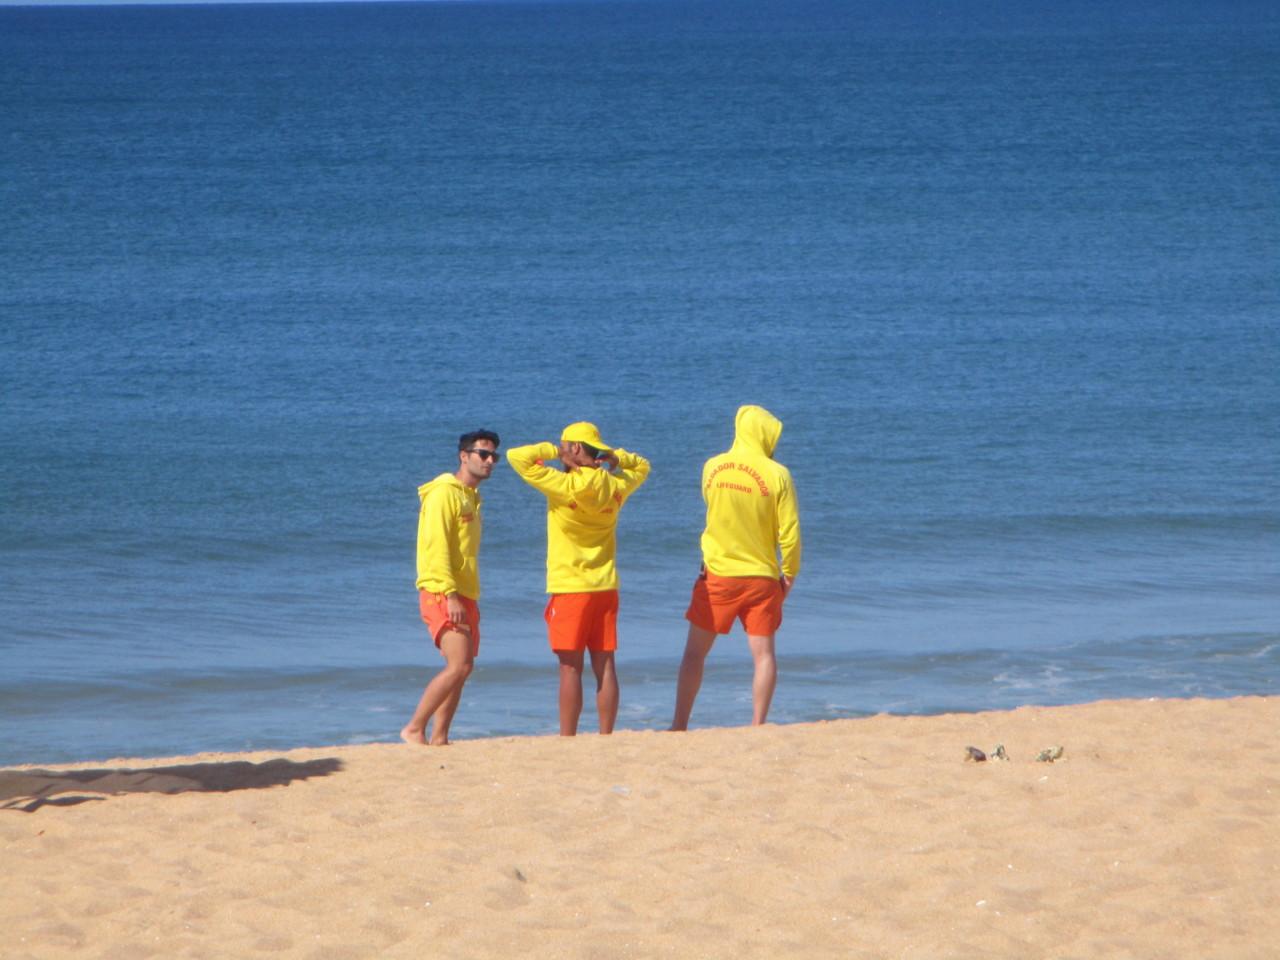 praia 2.JPG